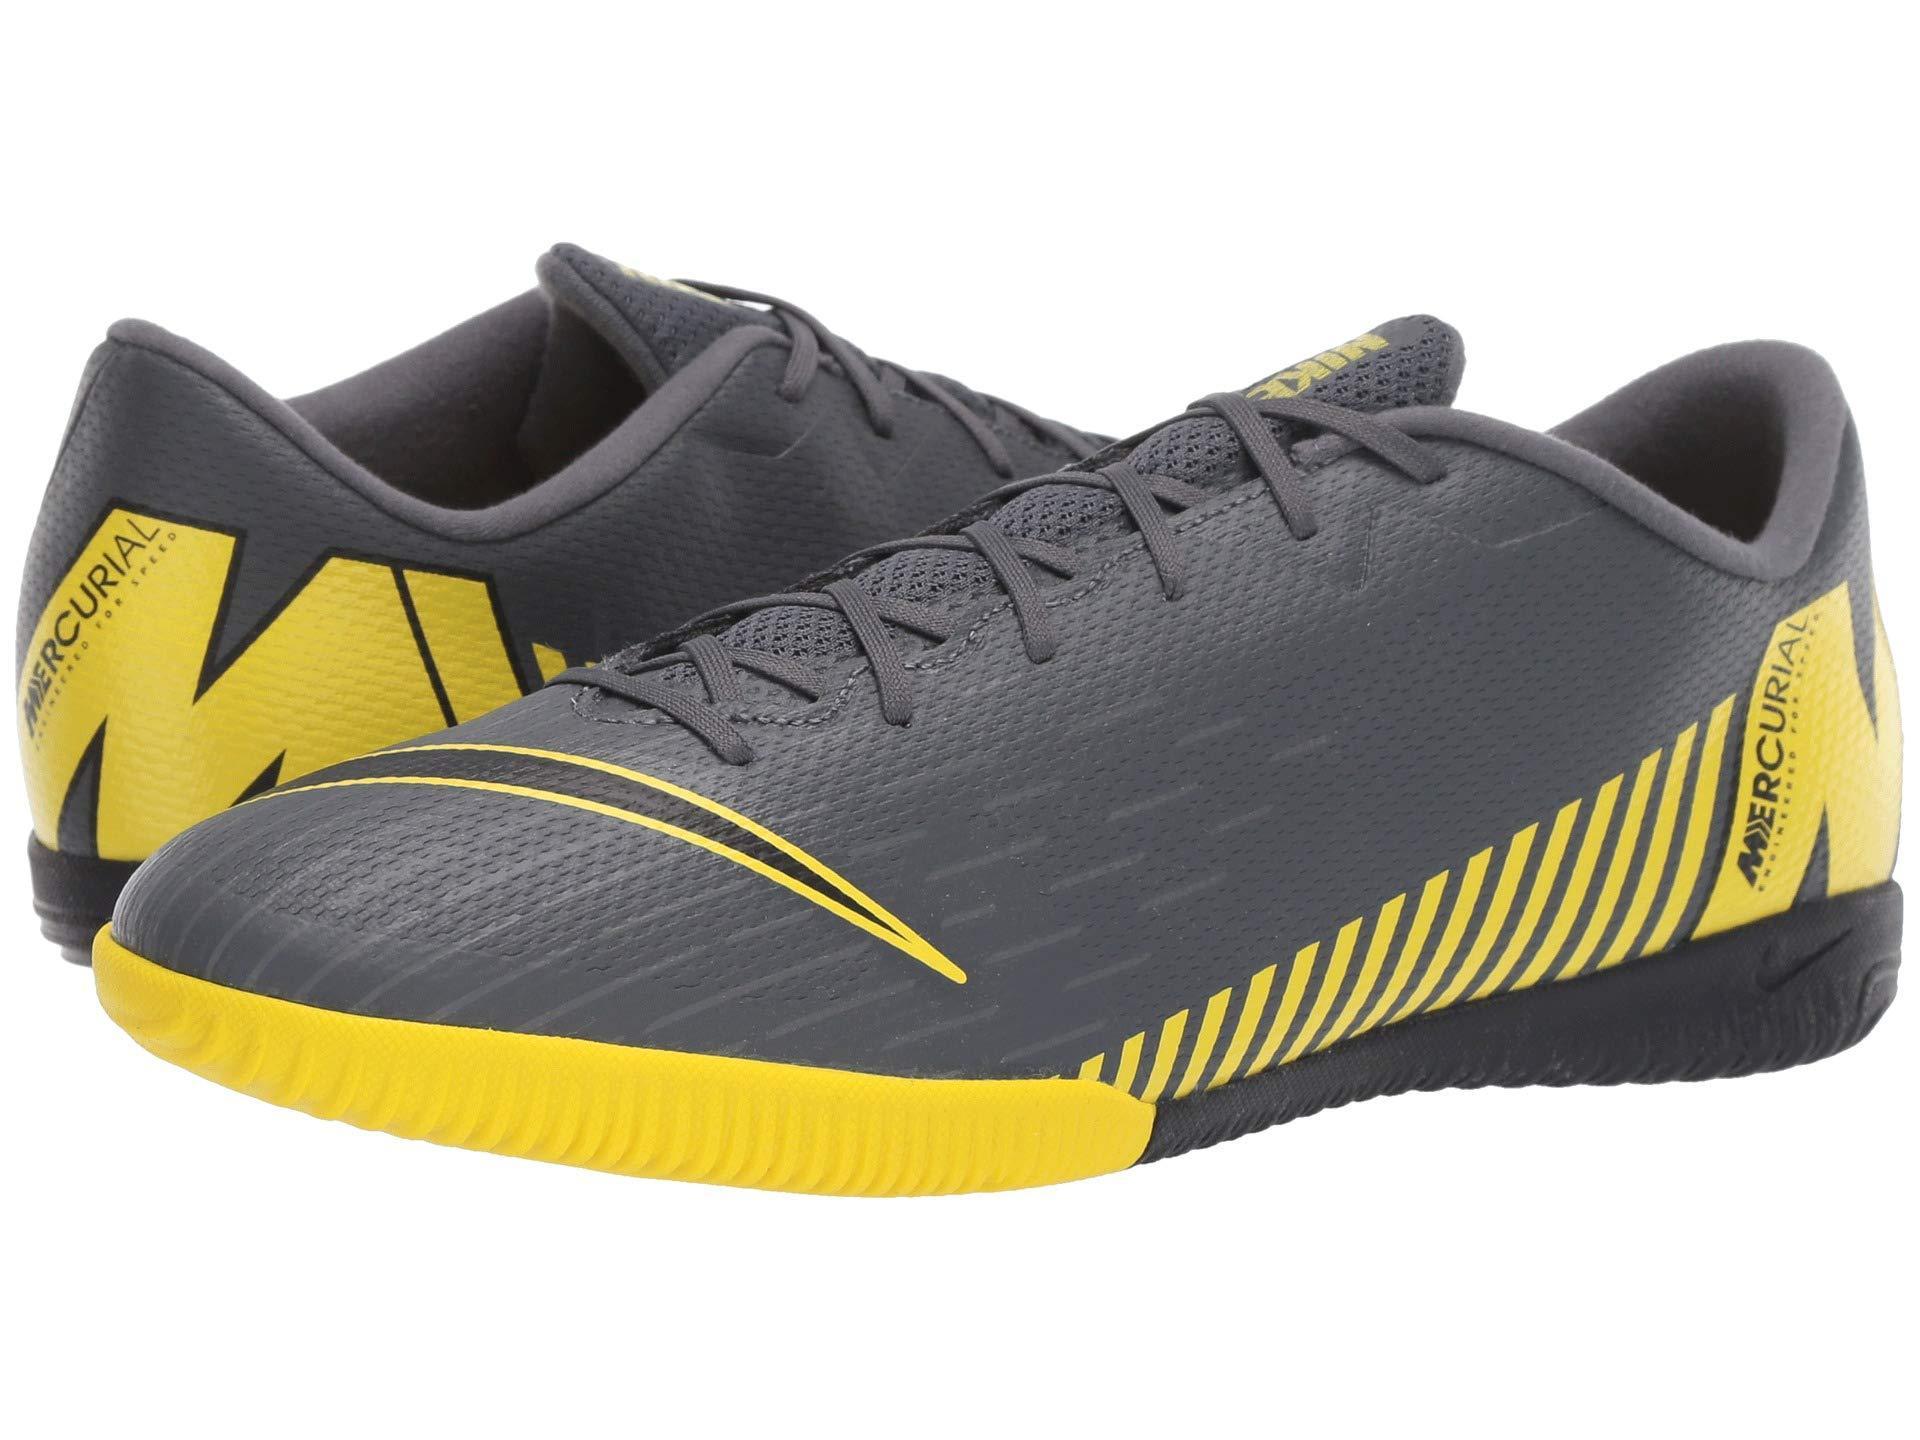 c034f87f2710 Lyst - Nike Vaporx 12 Academy Ic (dark Grey/black/opti Yellow) Men's ...